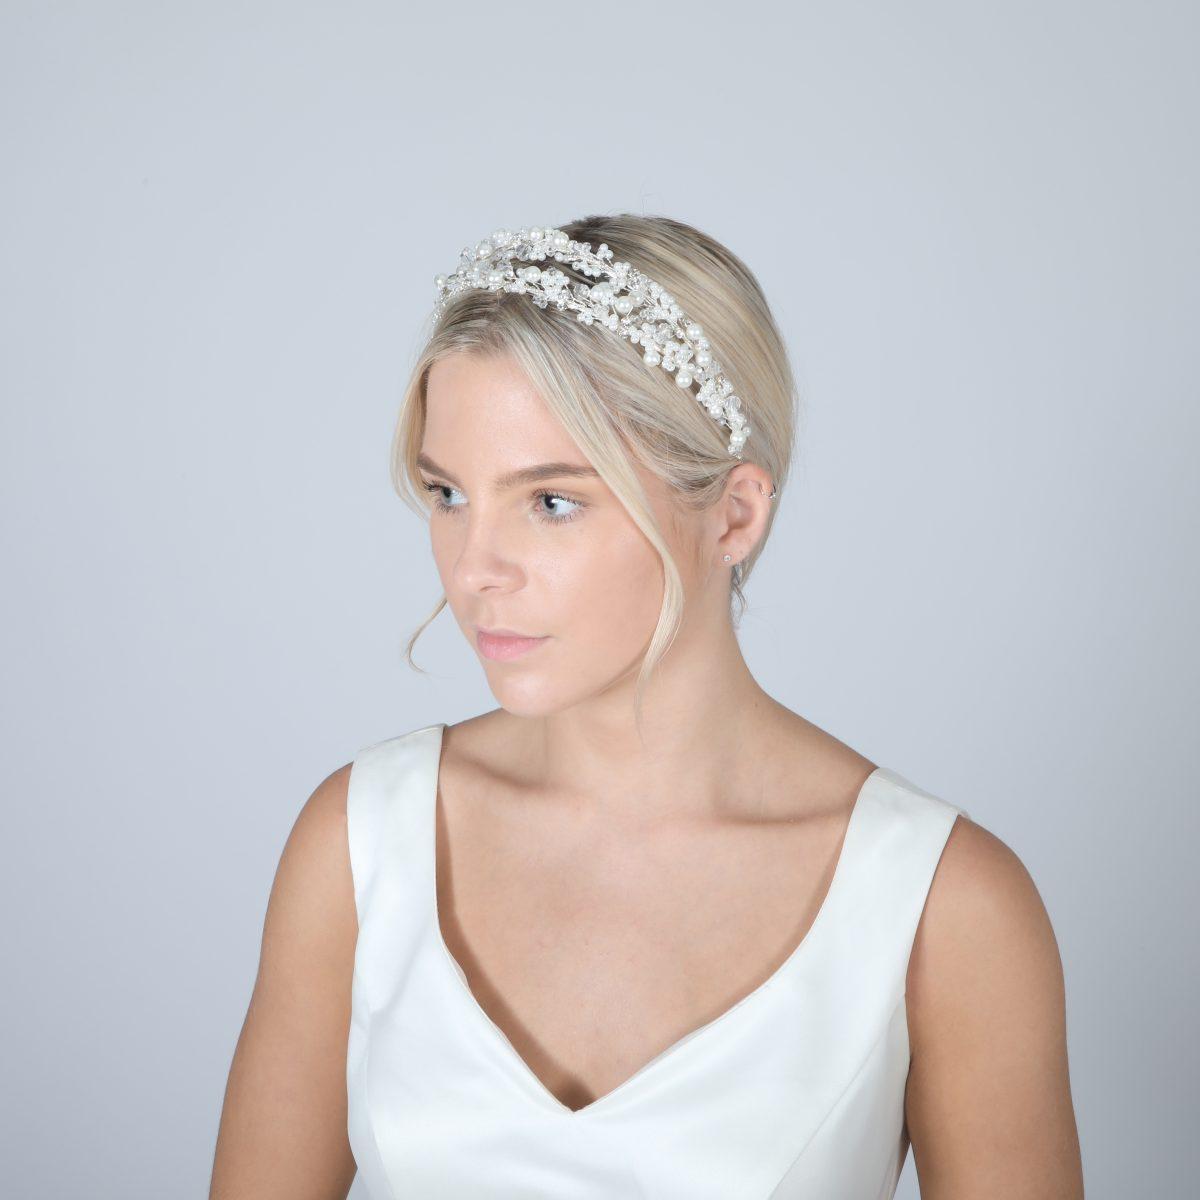 Perfect Bridal Tiara - PBT5023 1